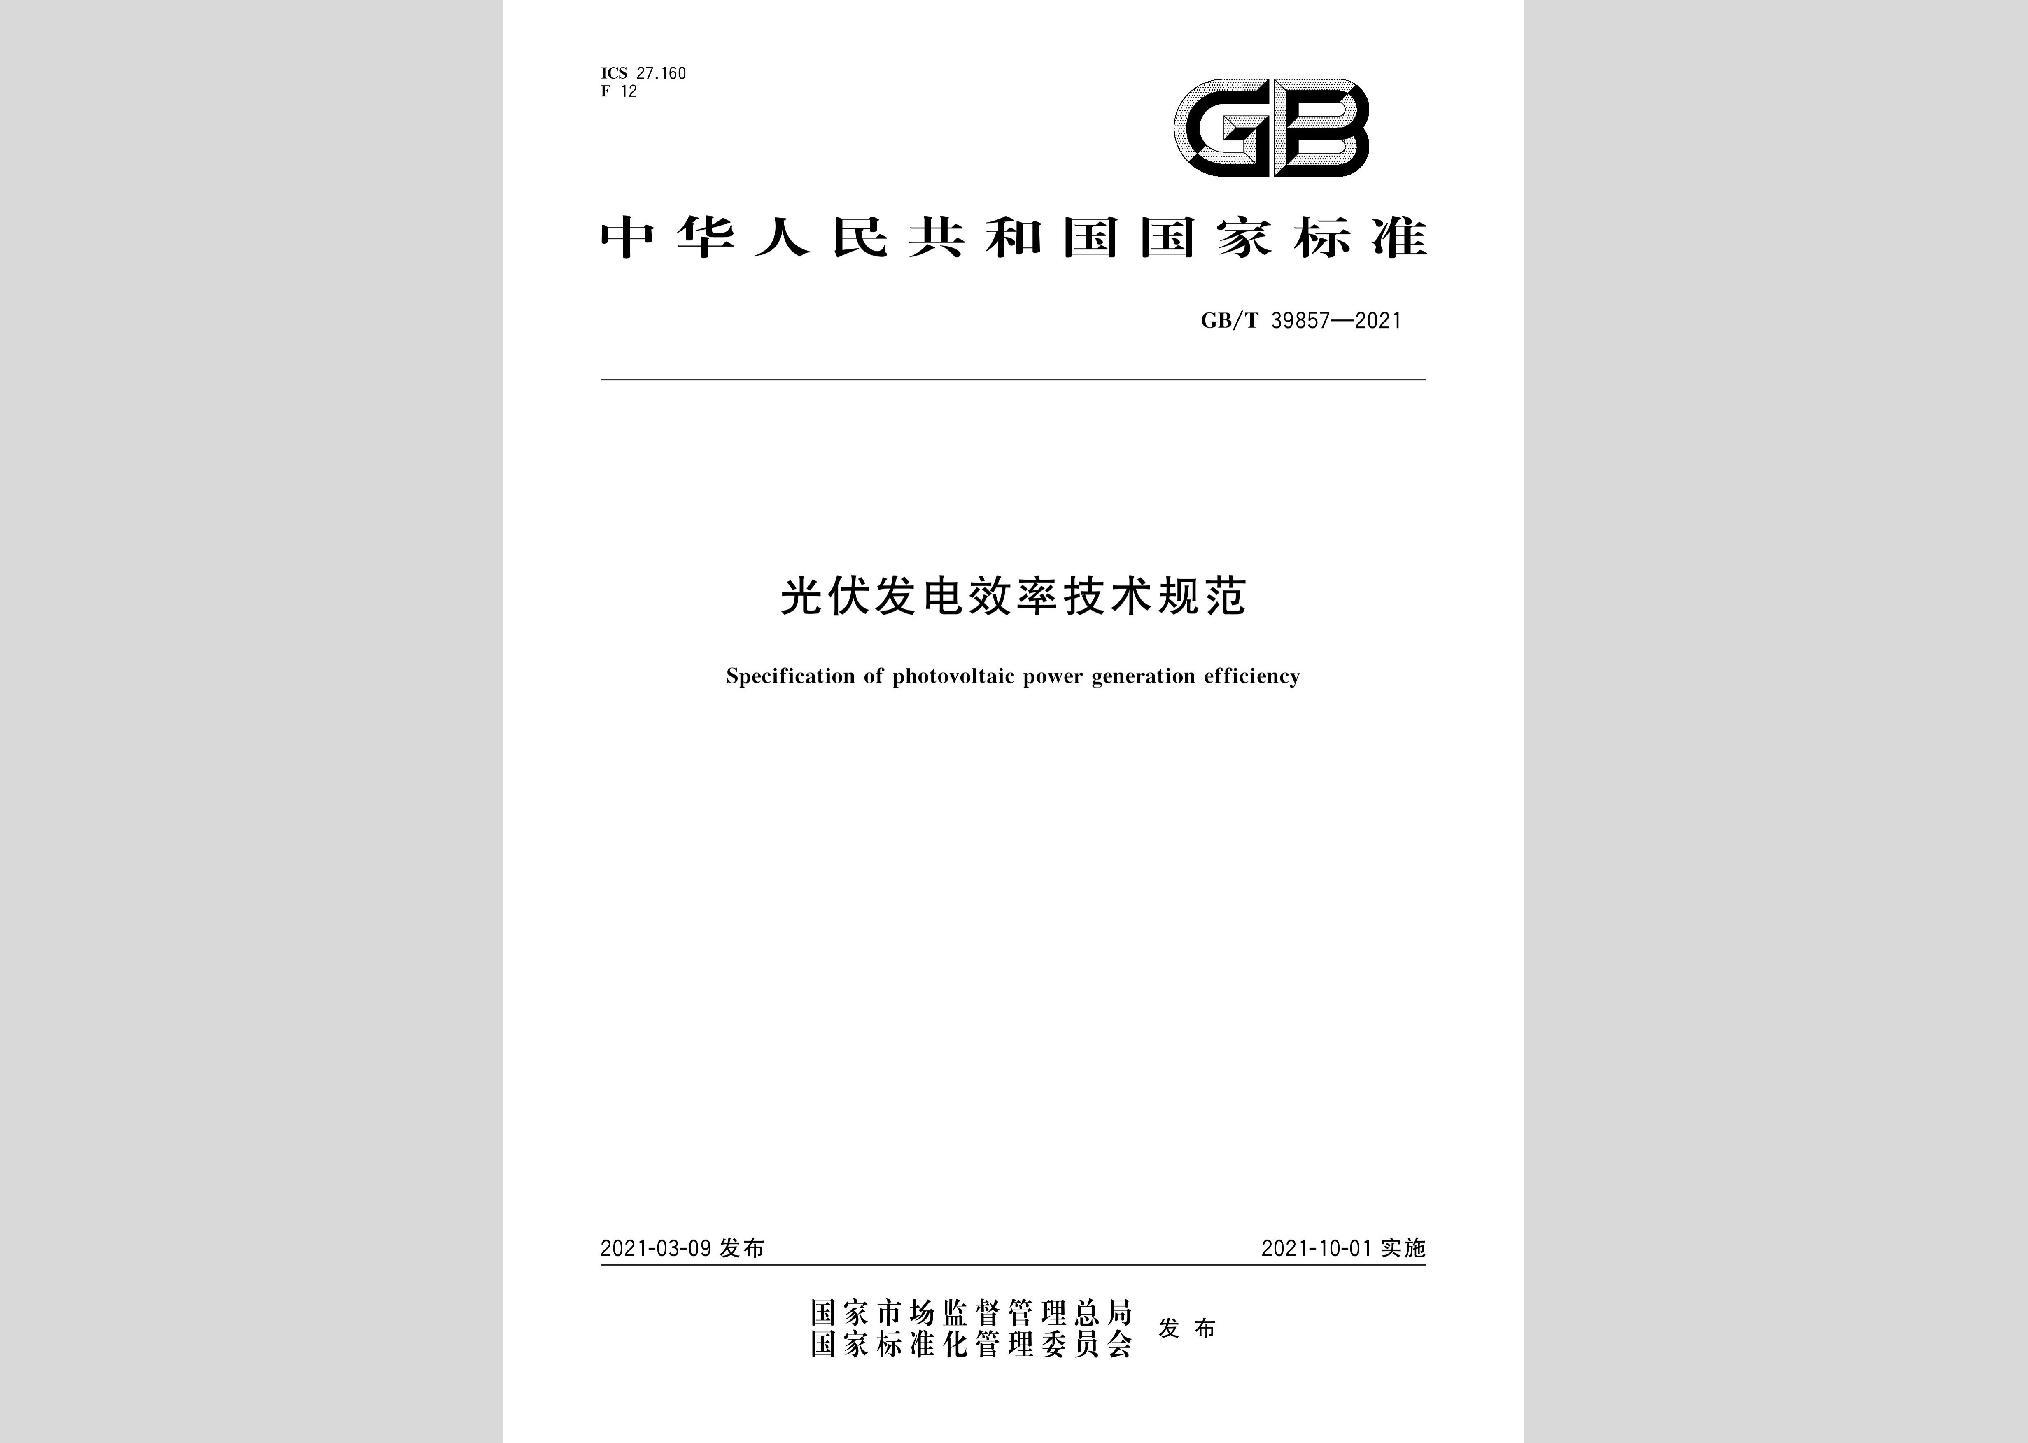 GB/T39857-2021:光伏发电效率技术规范